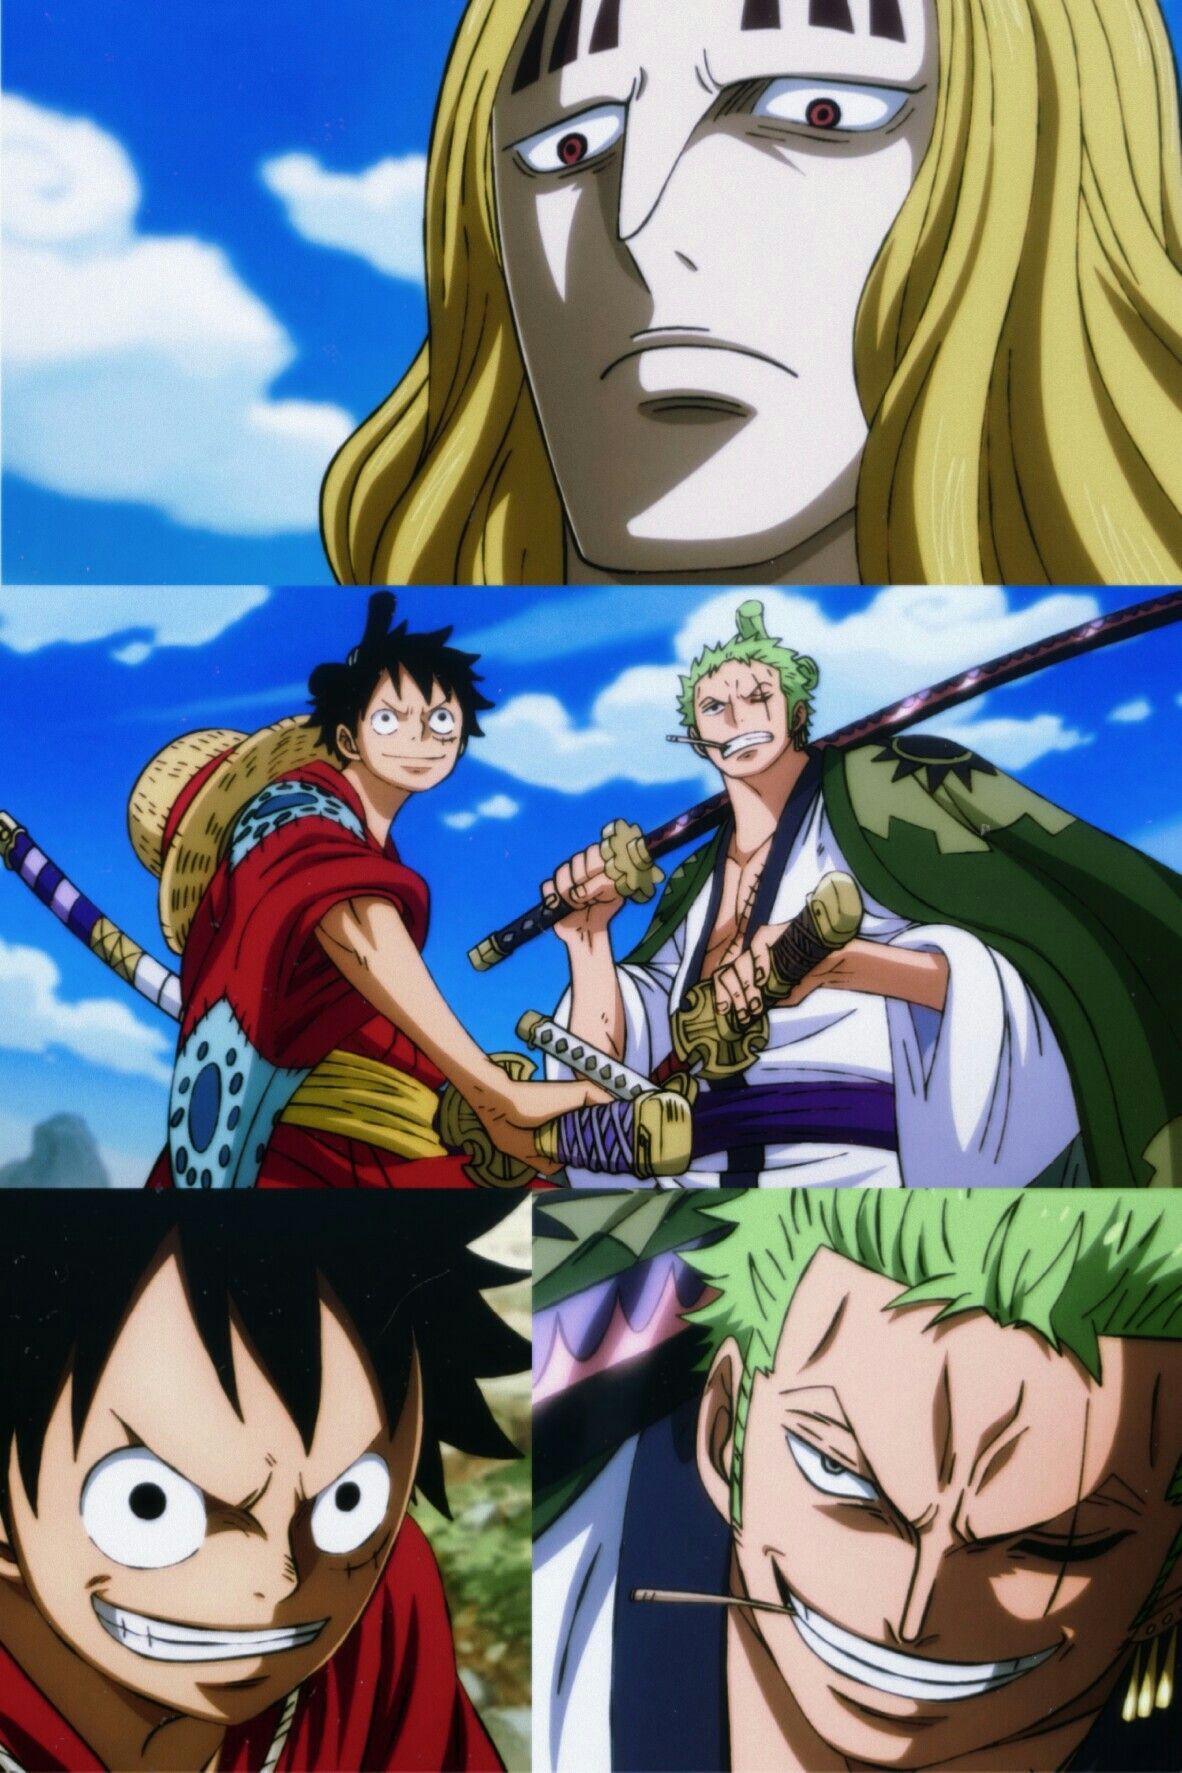 pin by roronoazoro on one piece one piece anime one piece anime